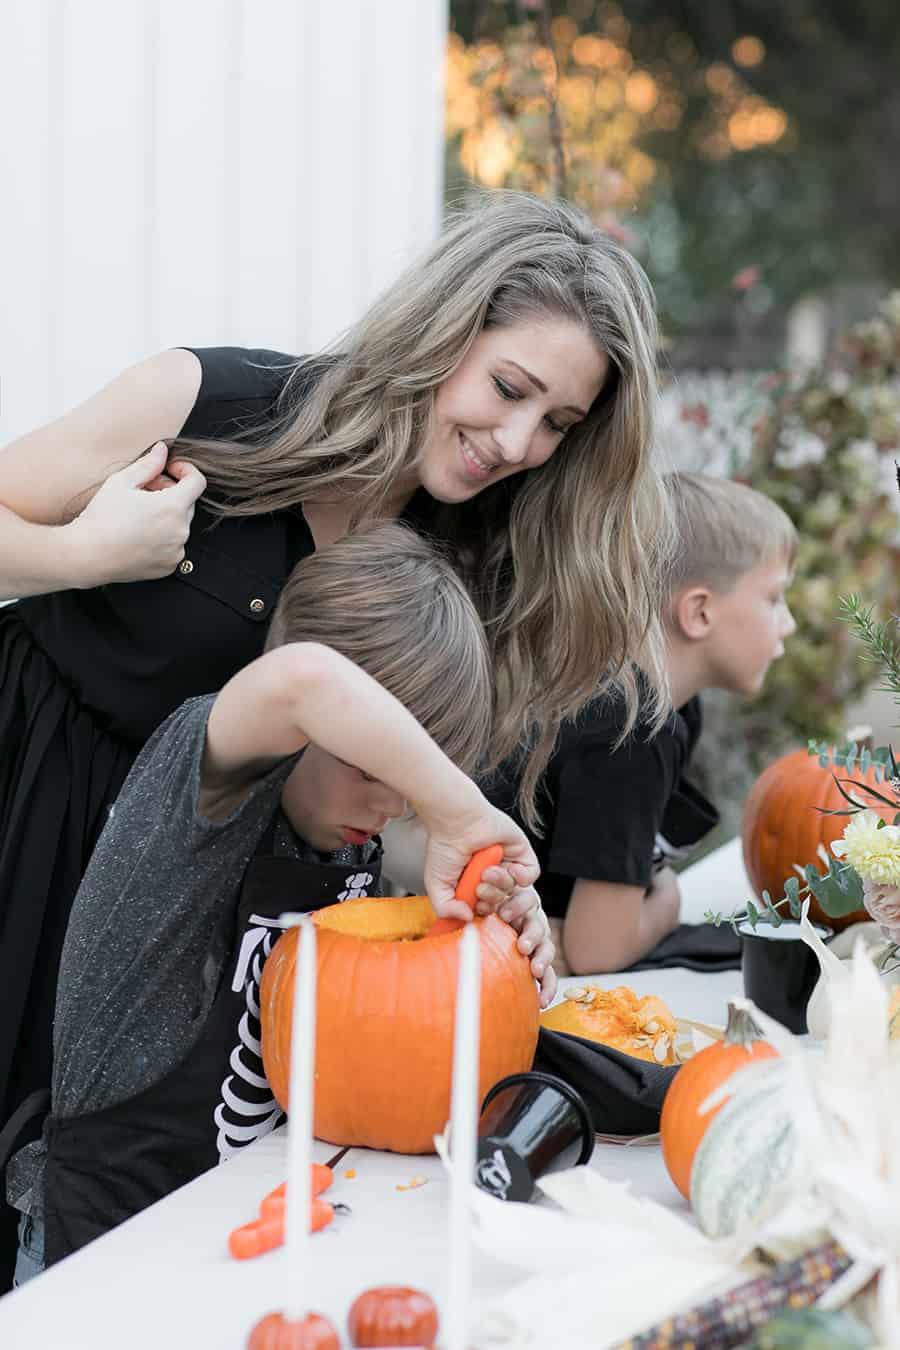 shot of eden helping child carve a pumpkin